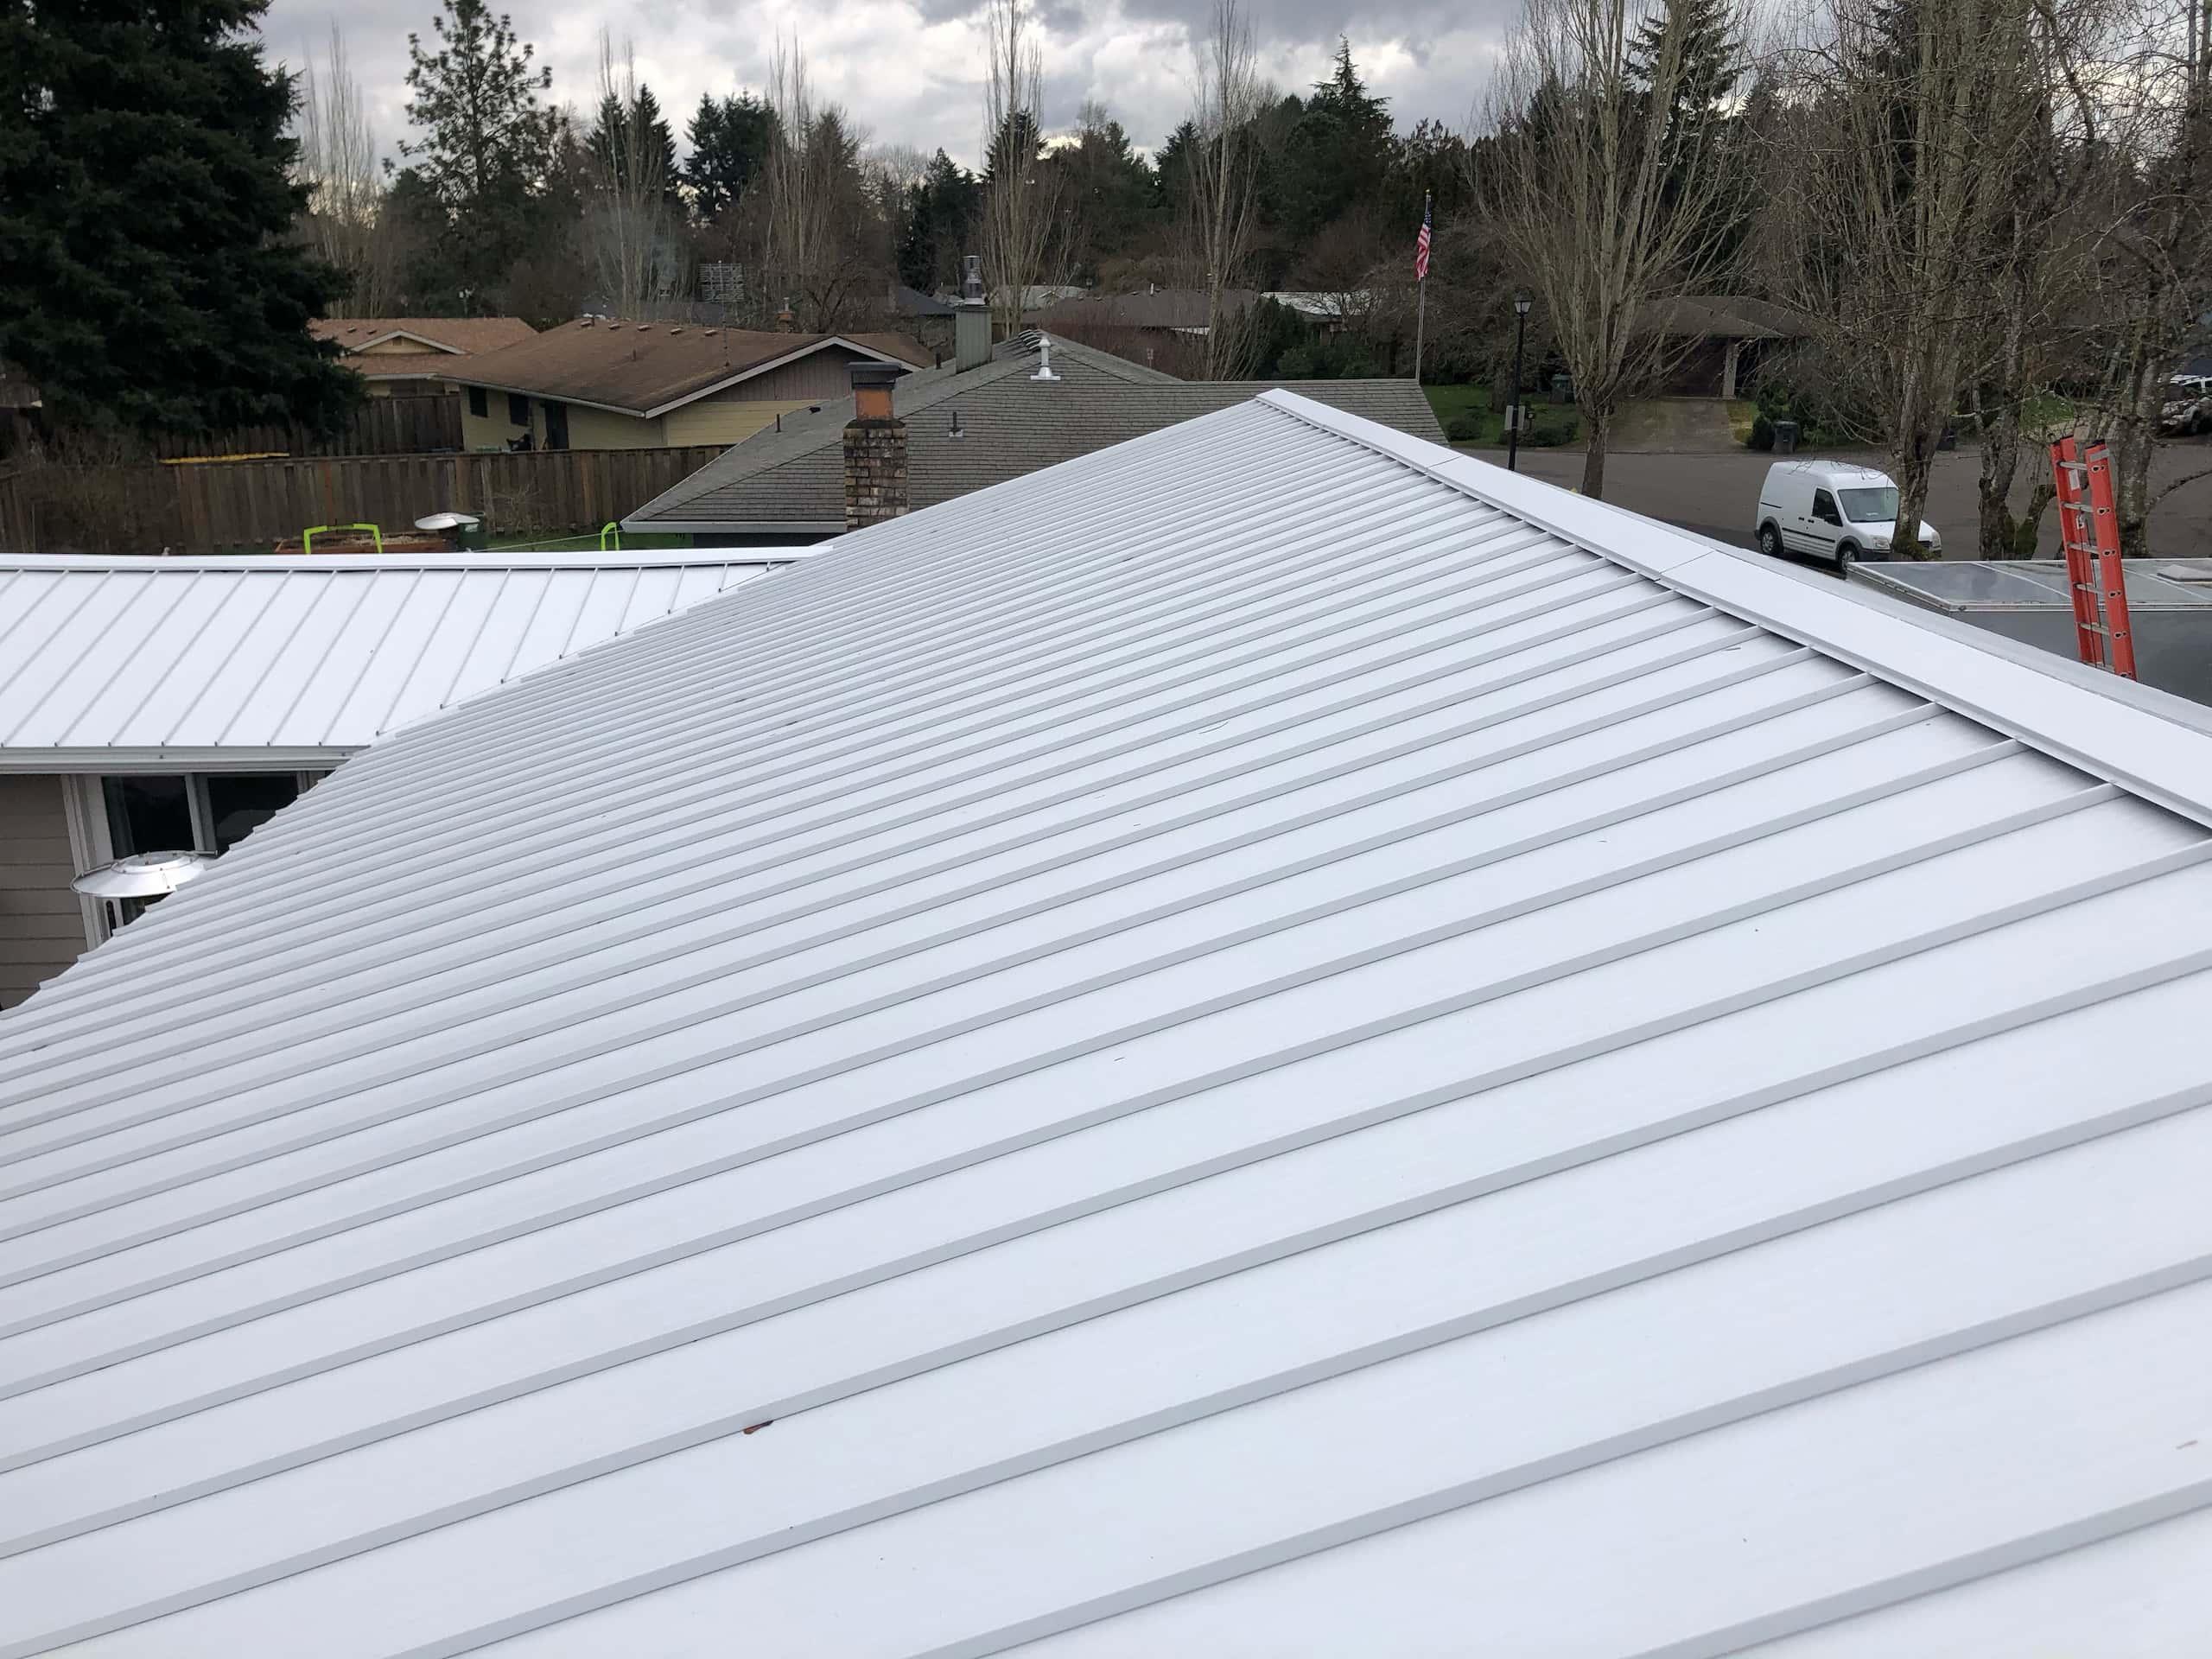 Reliance Roof Pros LLC | Beaverton | New Roof | Taylor Metal 24 Gauge Kynar | Glacier White | Side View